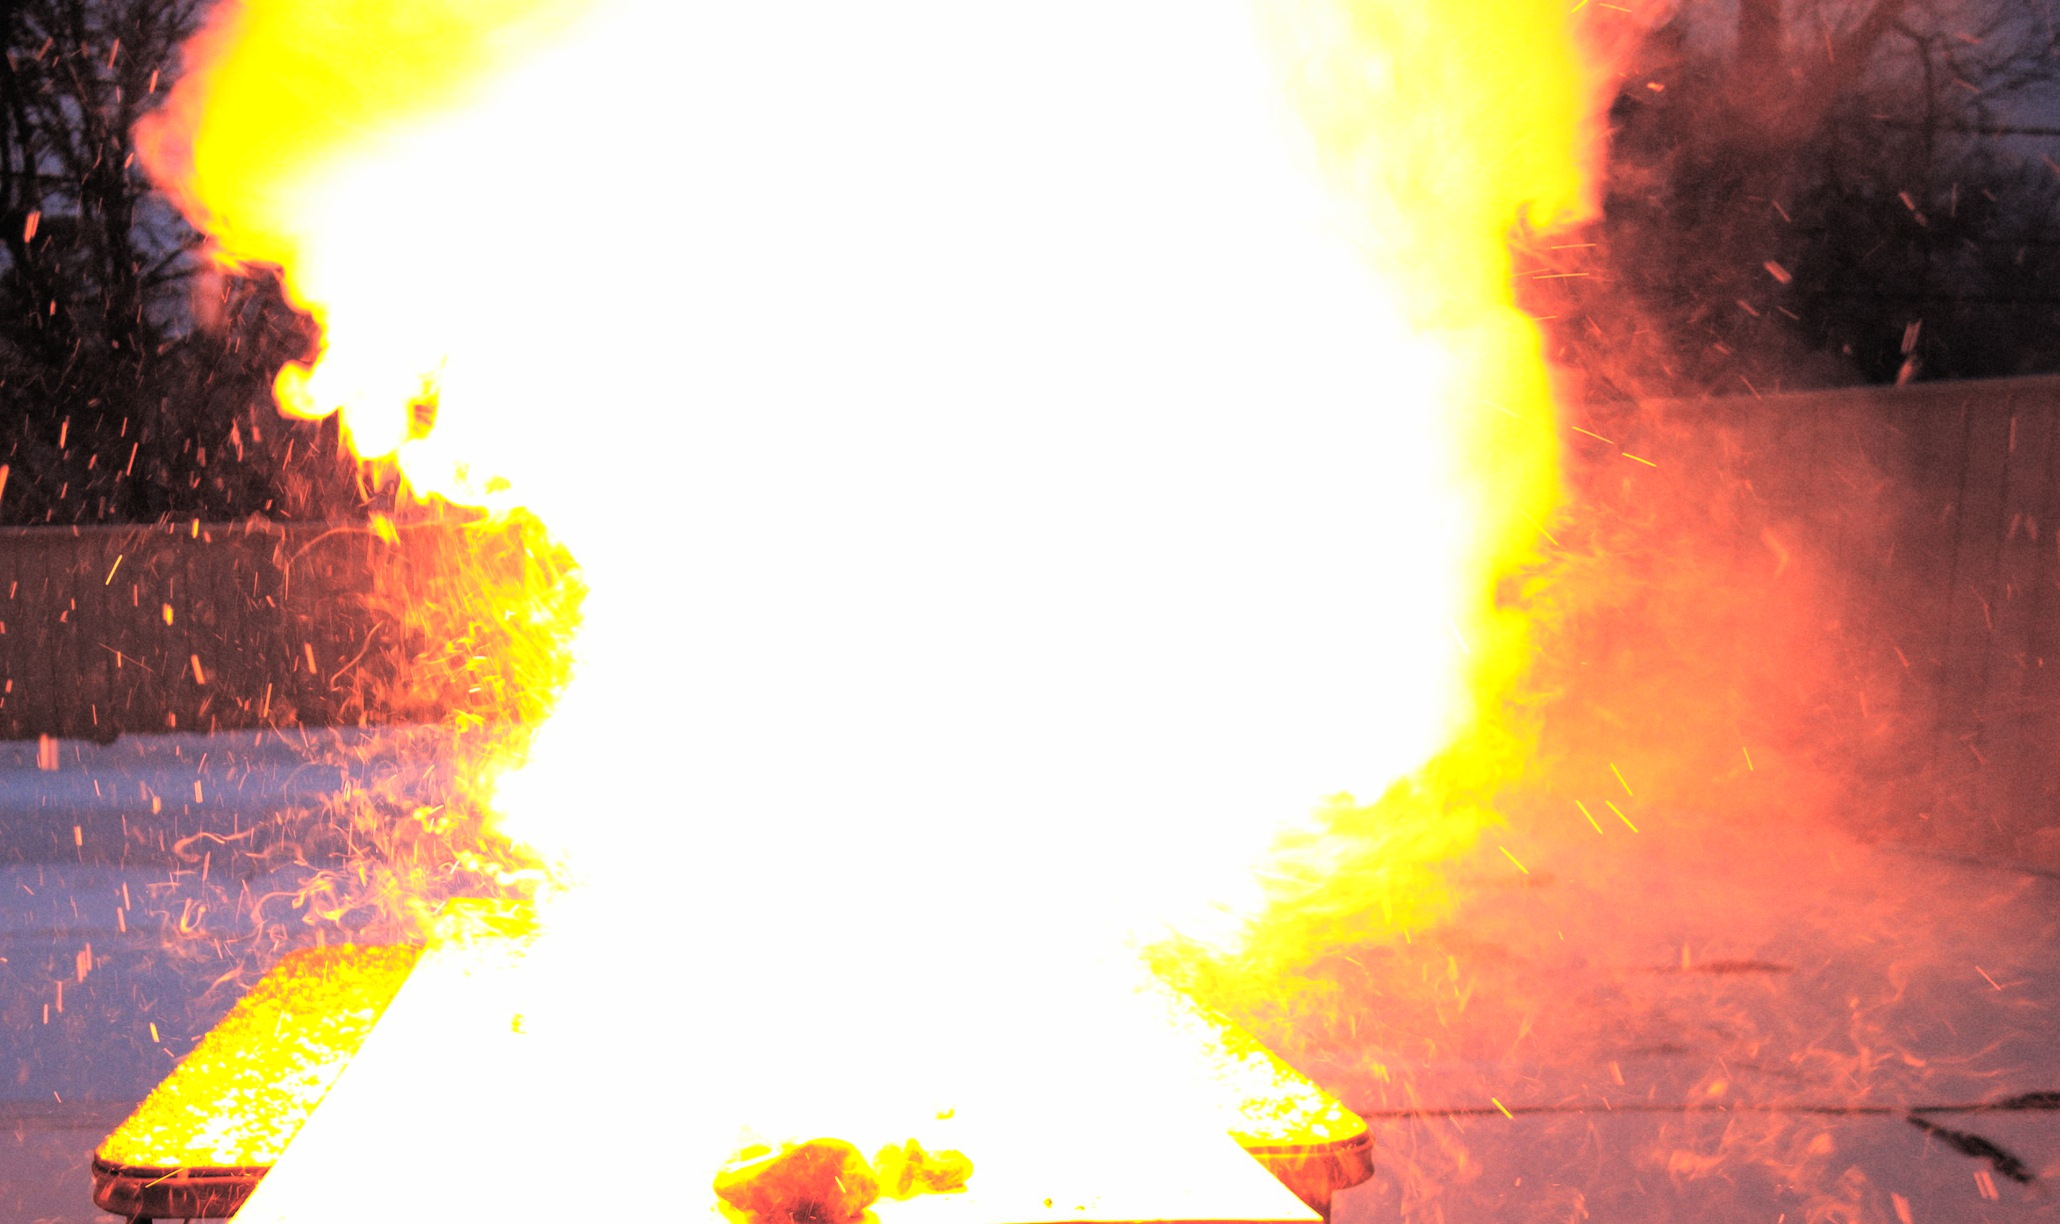 Explosion CB2 Yellow.jpg